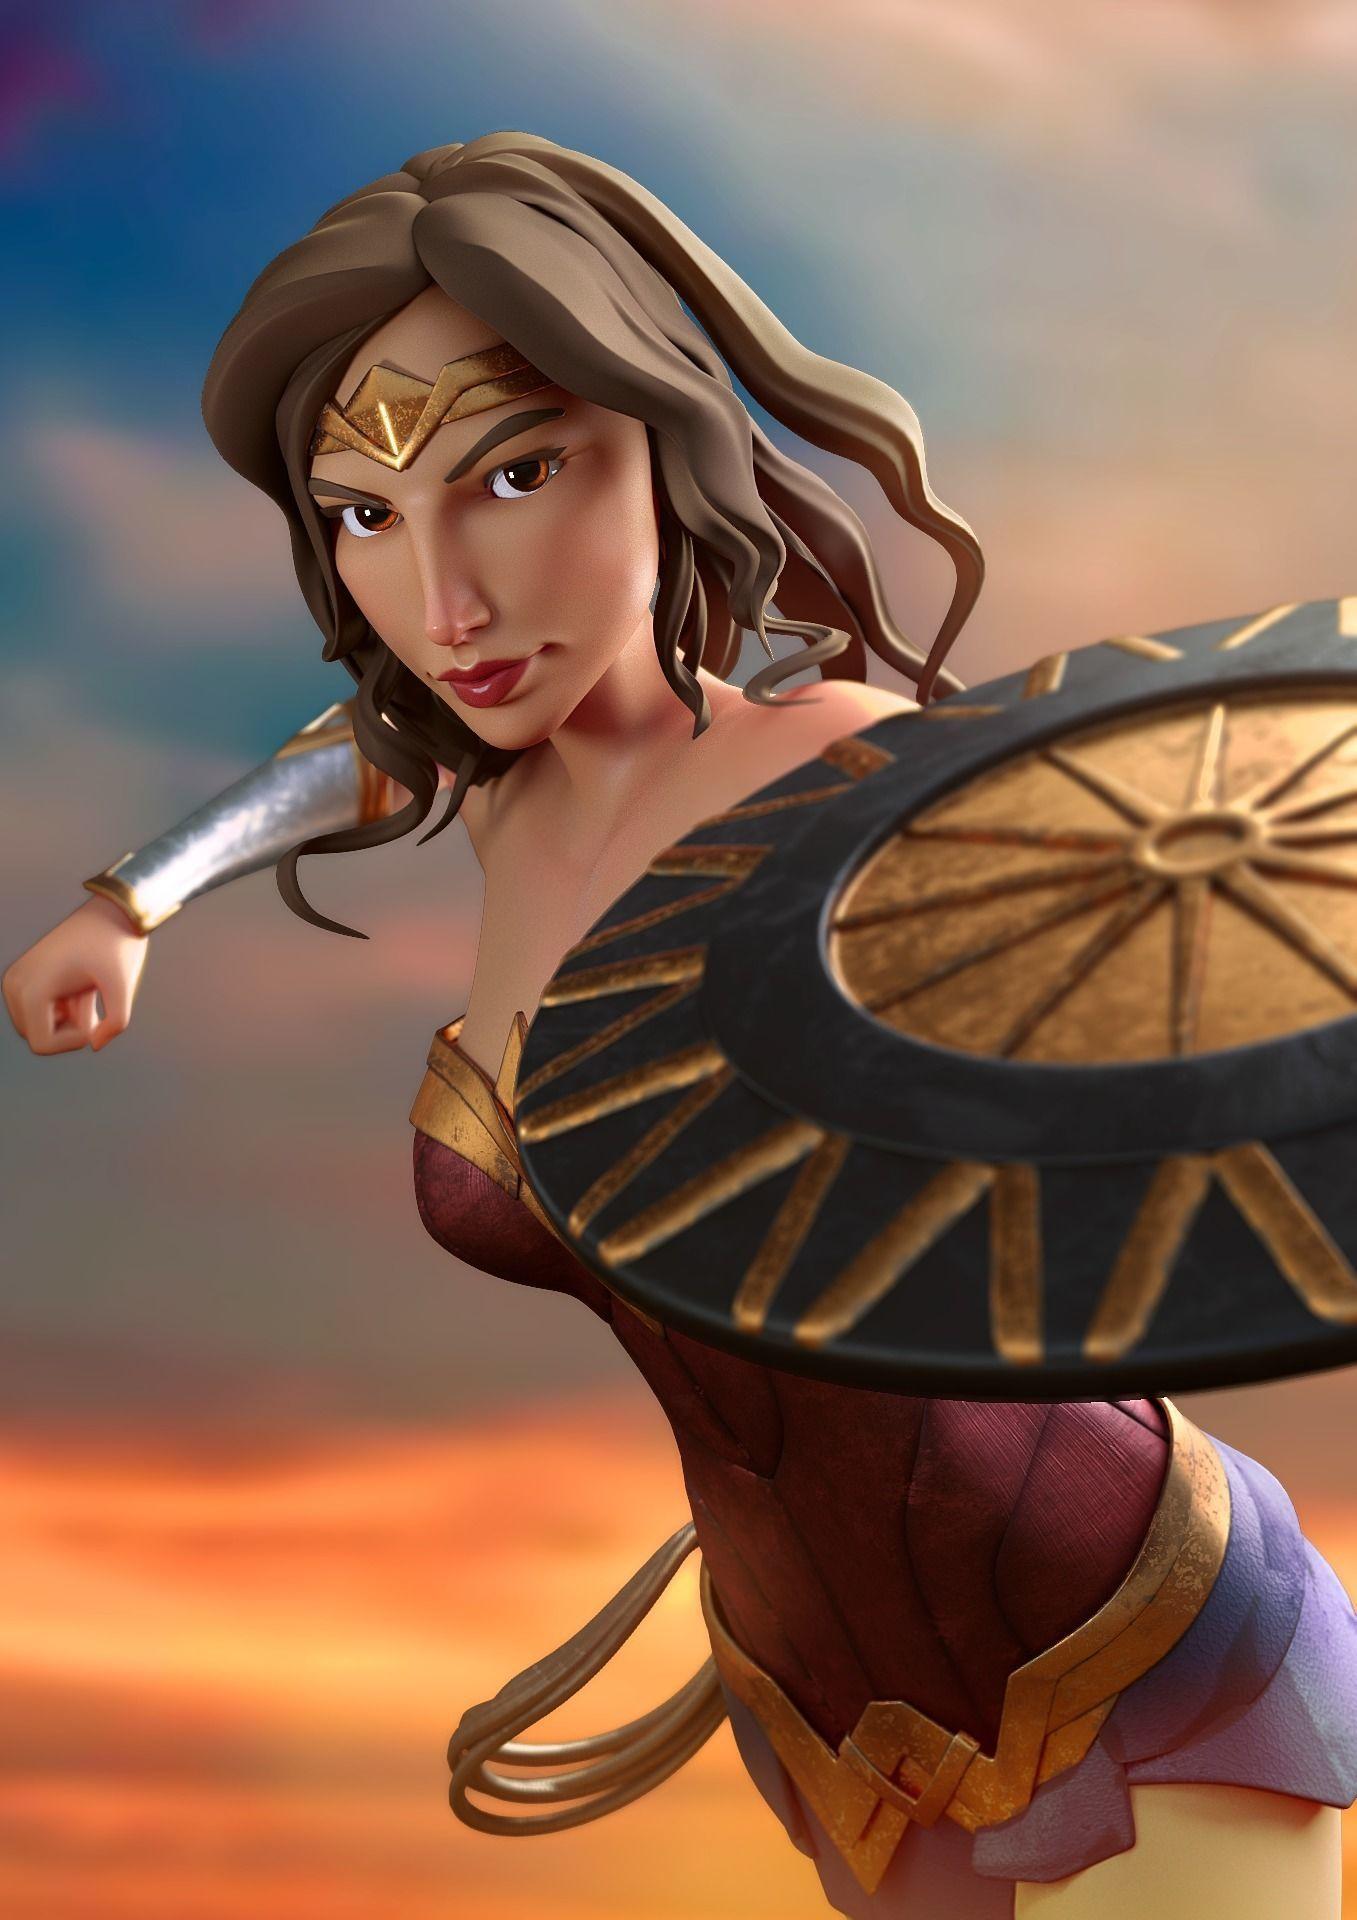 Wonder Woman cartoon model